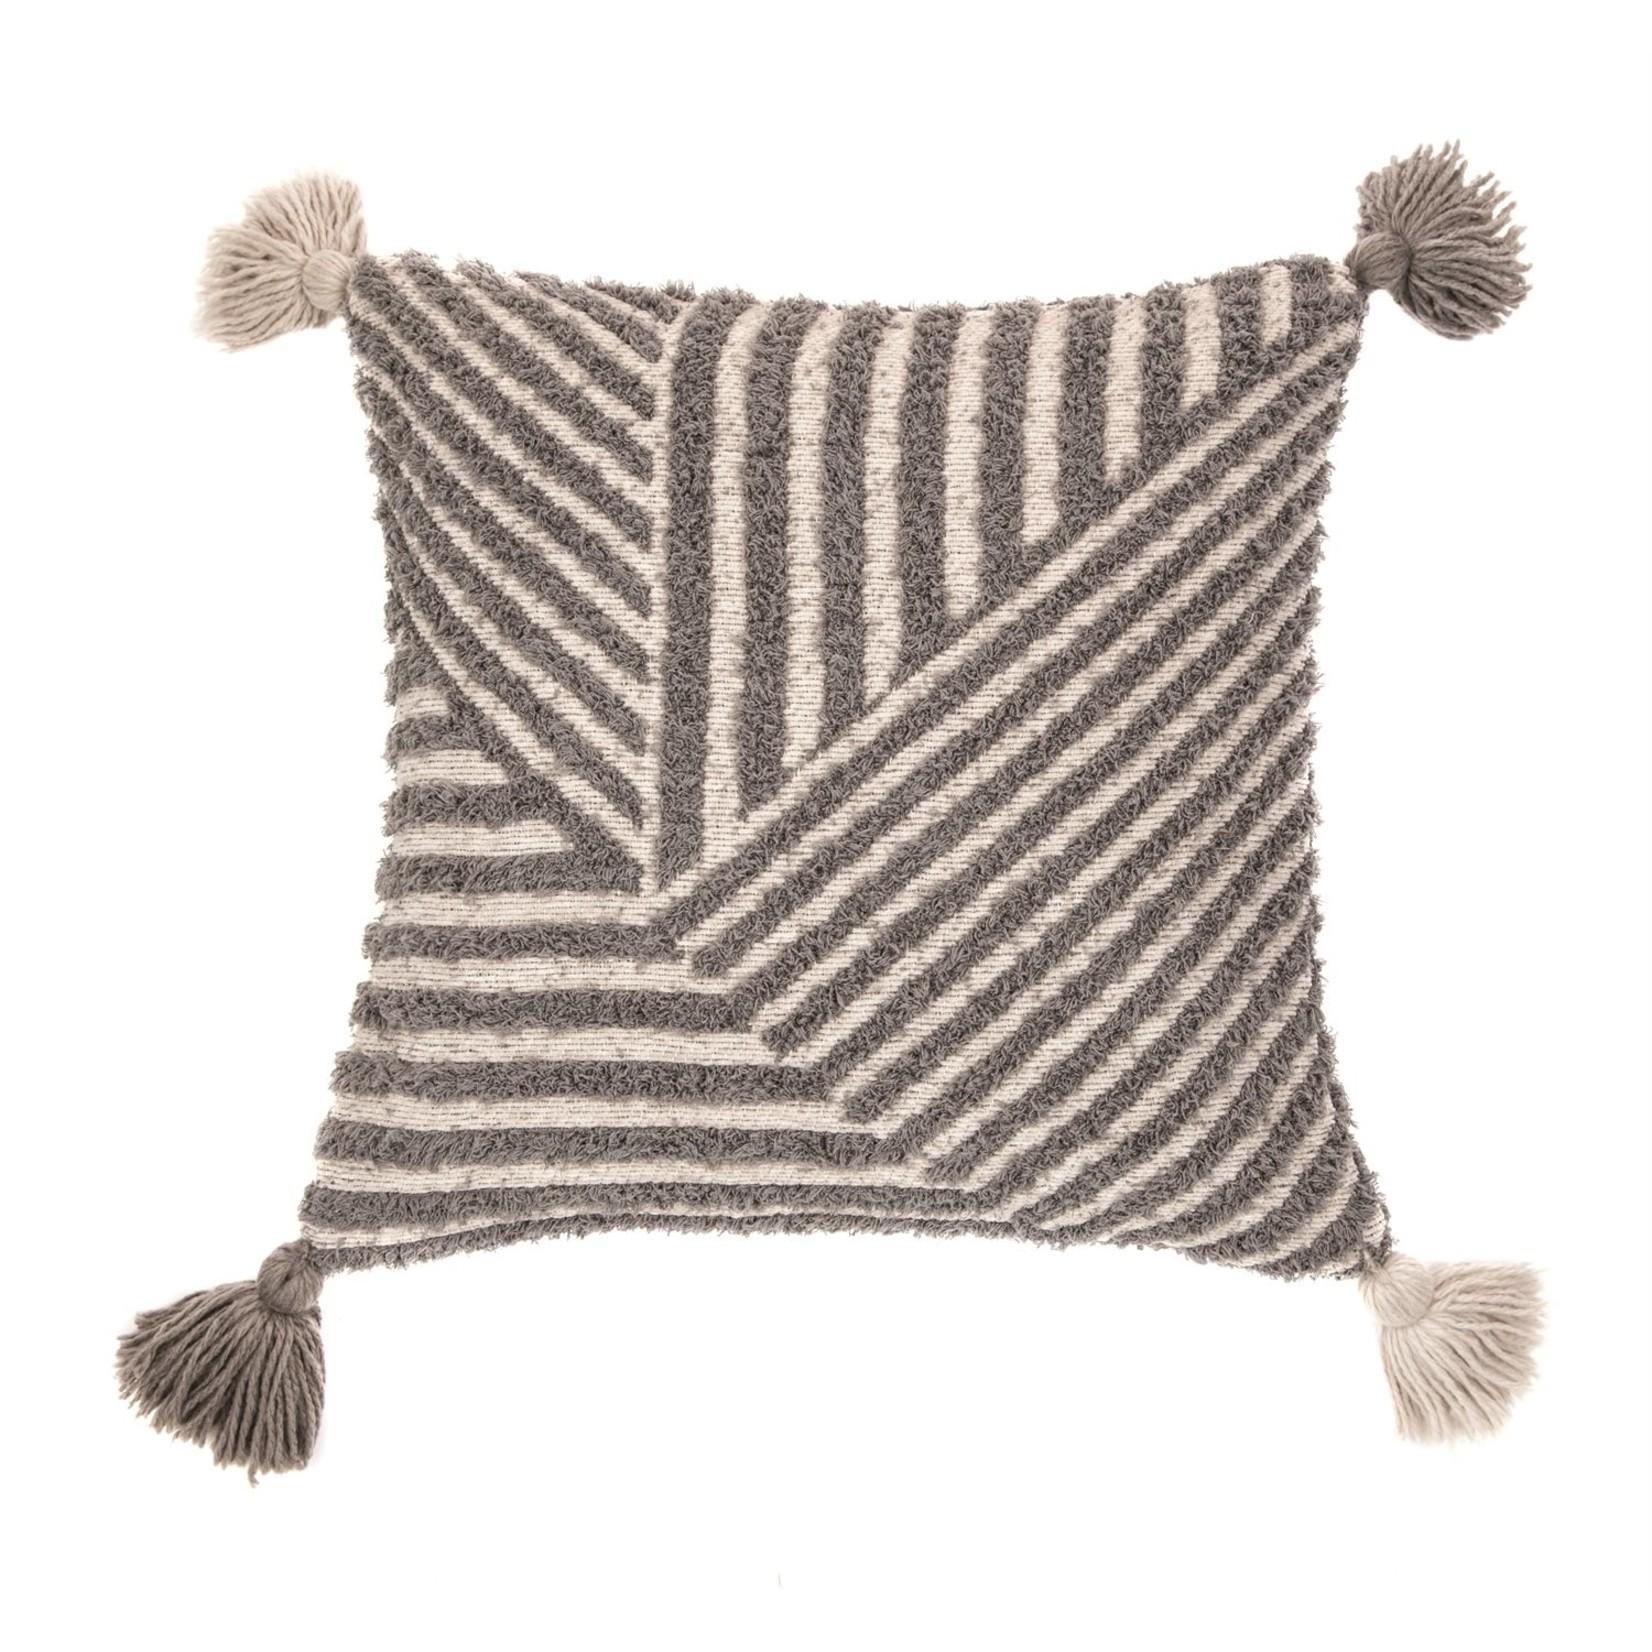 Brunelli Sutra Cushion